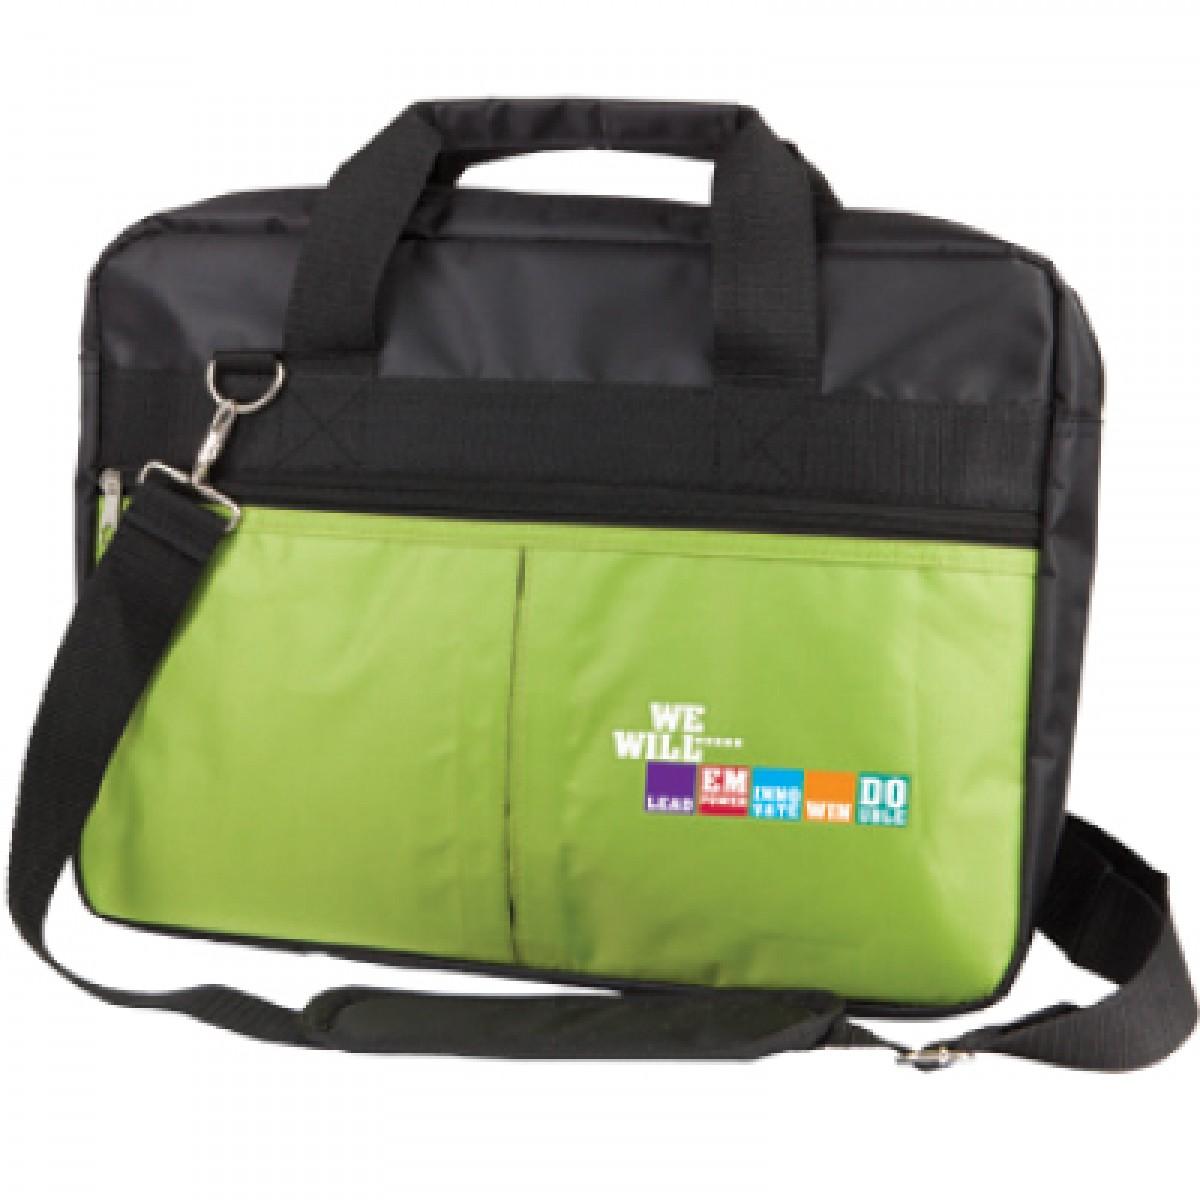 Sac pour ordinateur portable - Tuto sac ordinateur portable ...